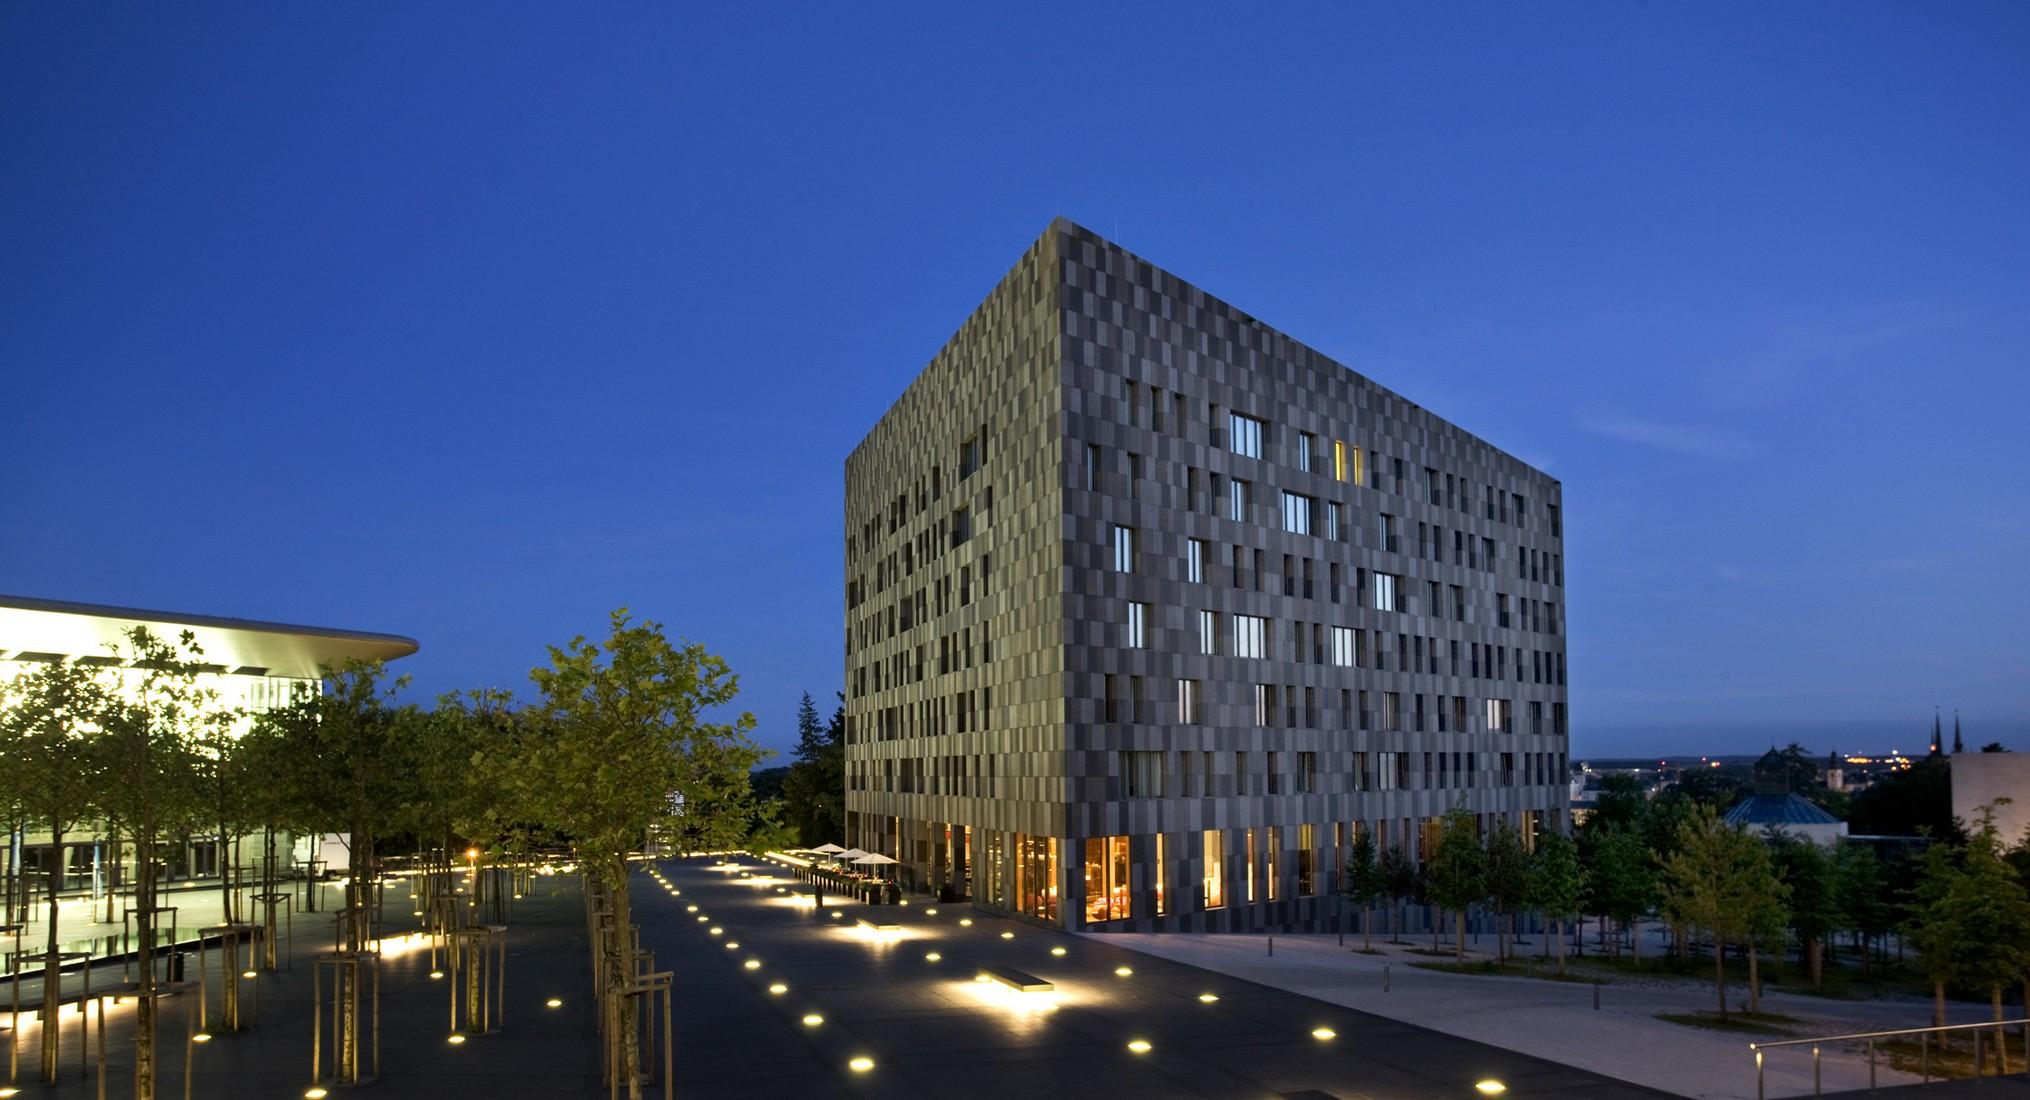 Hotel melia luxembourg atelier darchitecture jim clemes archello